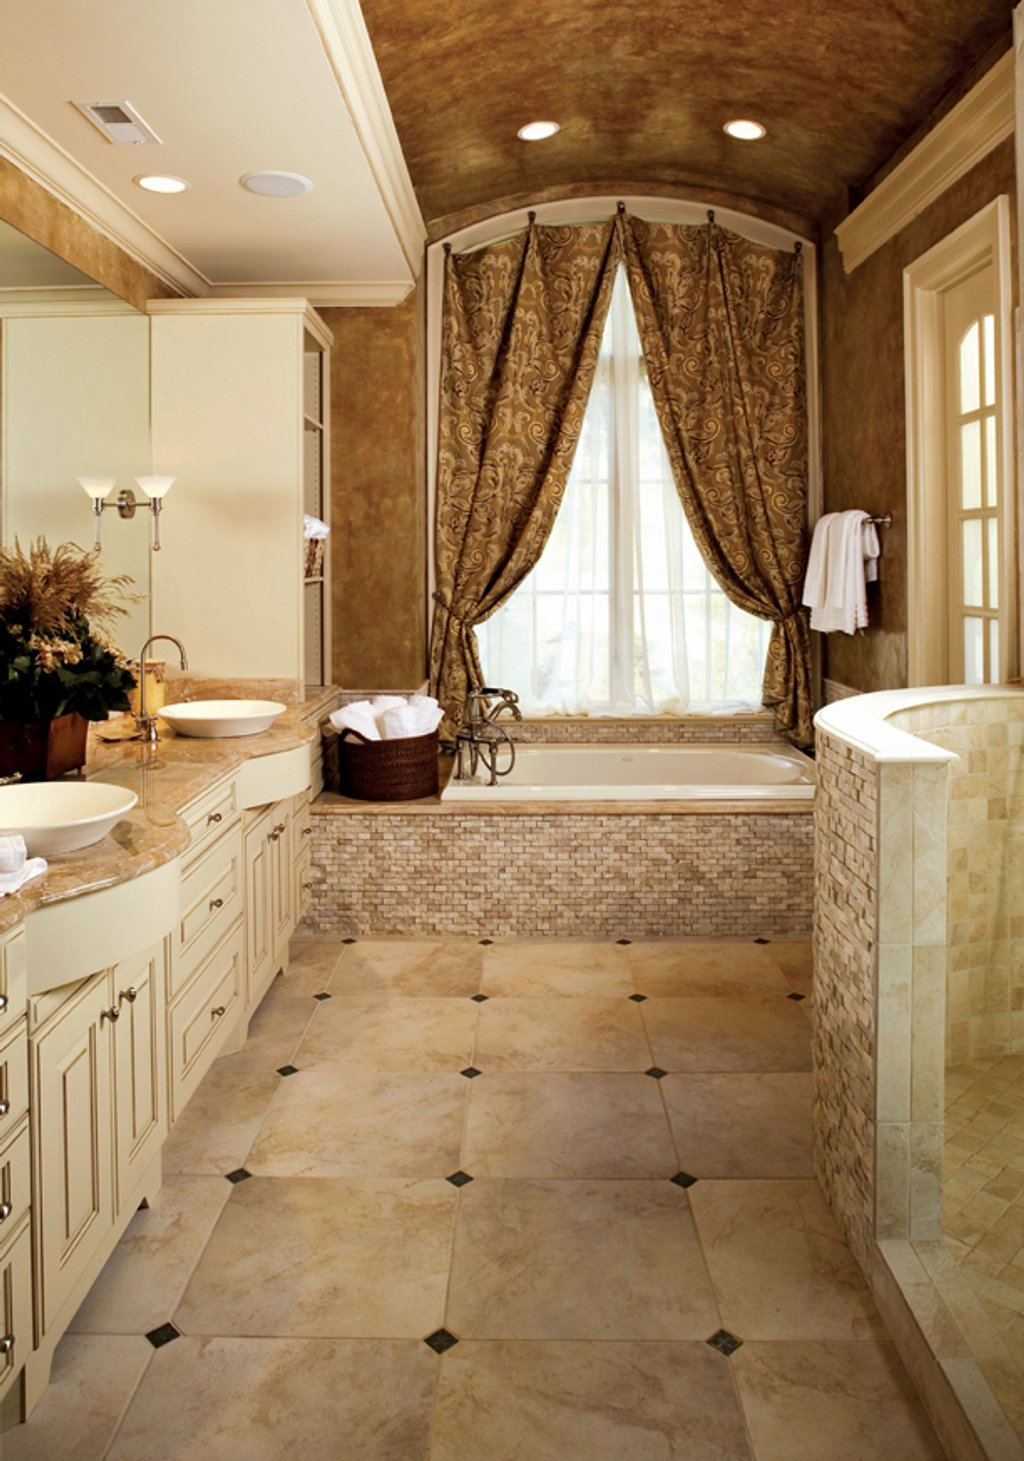 European Style House Plan 5 Beds 5 Baths 4357 Sq Ft Plan